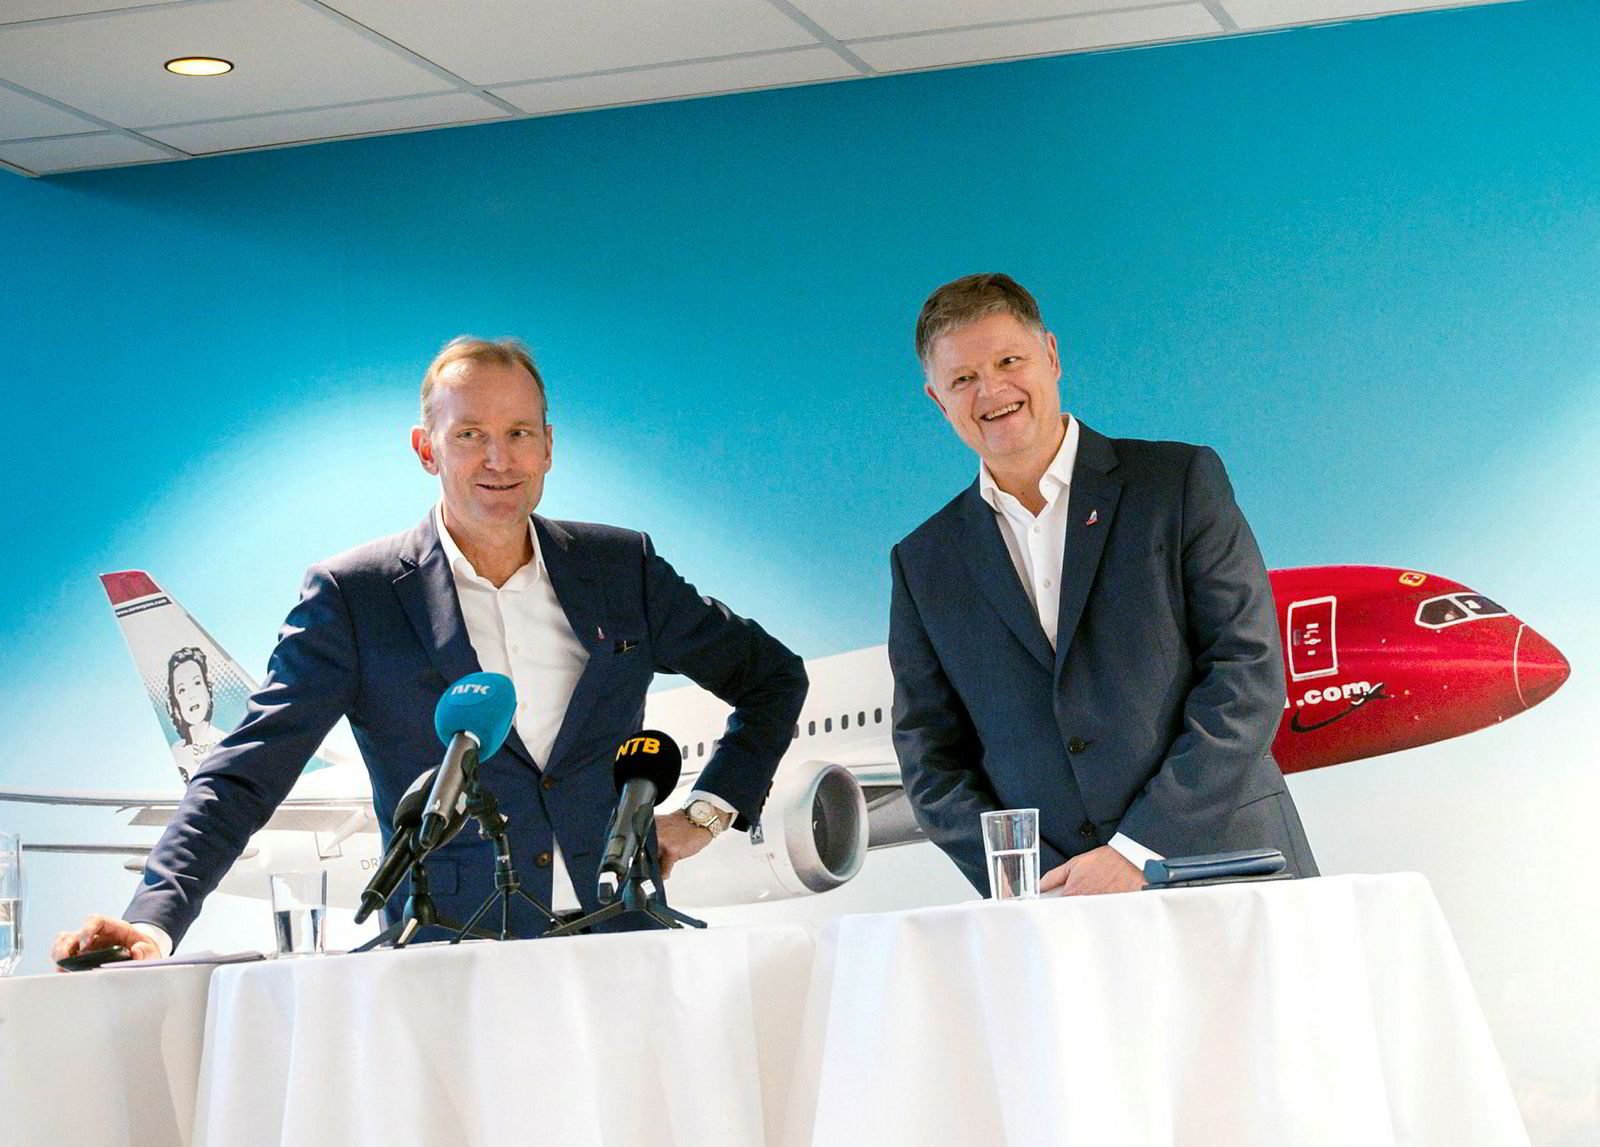 Styreleder Niels Smedegaard (tv) presenterte Jacob Schram som ny Norwegian-sjef under pressekonferanse på Fornebu.